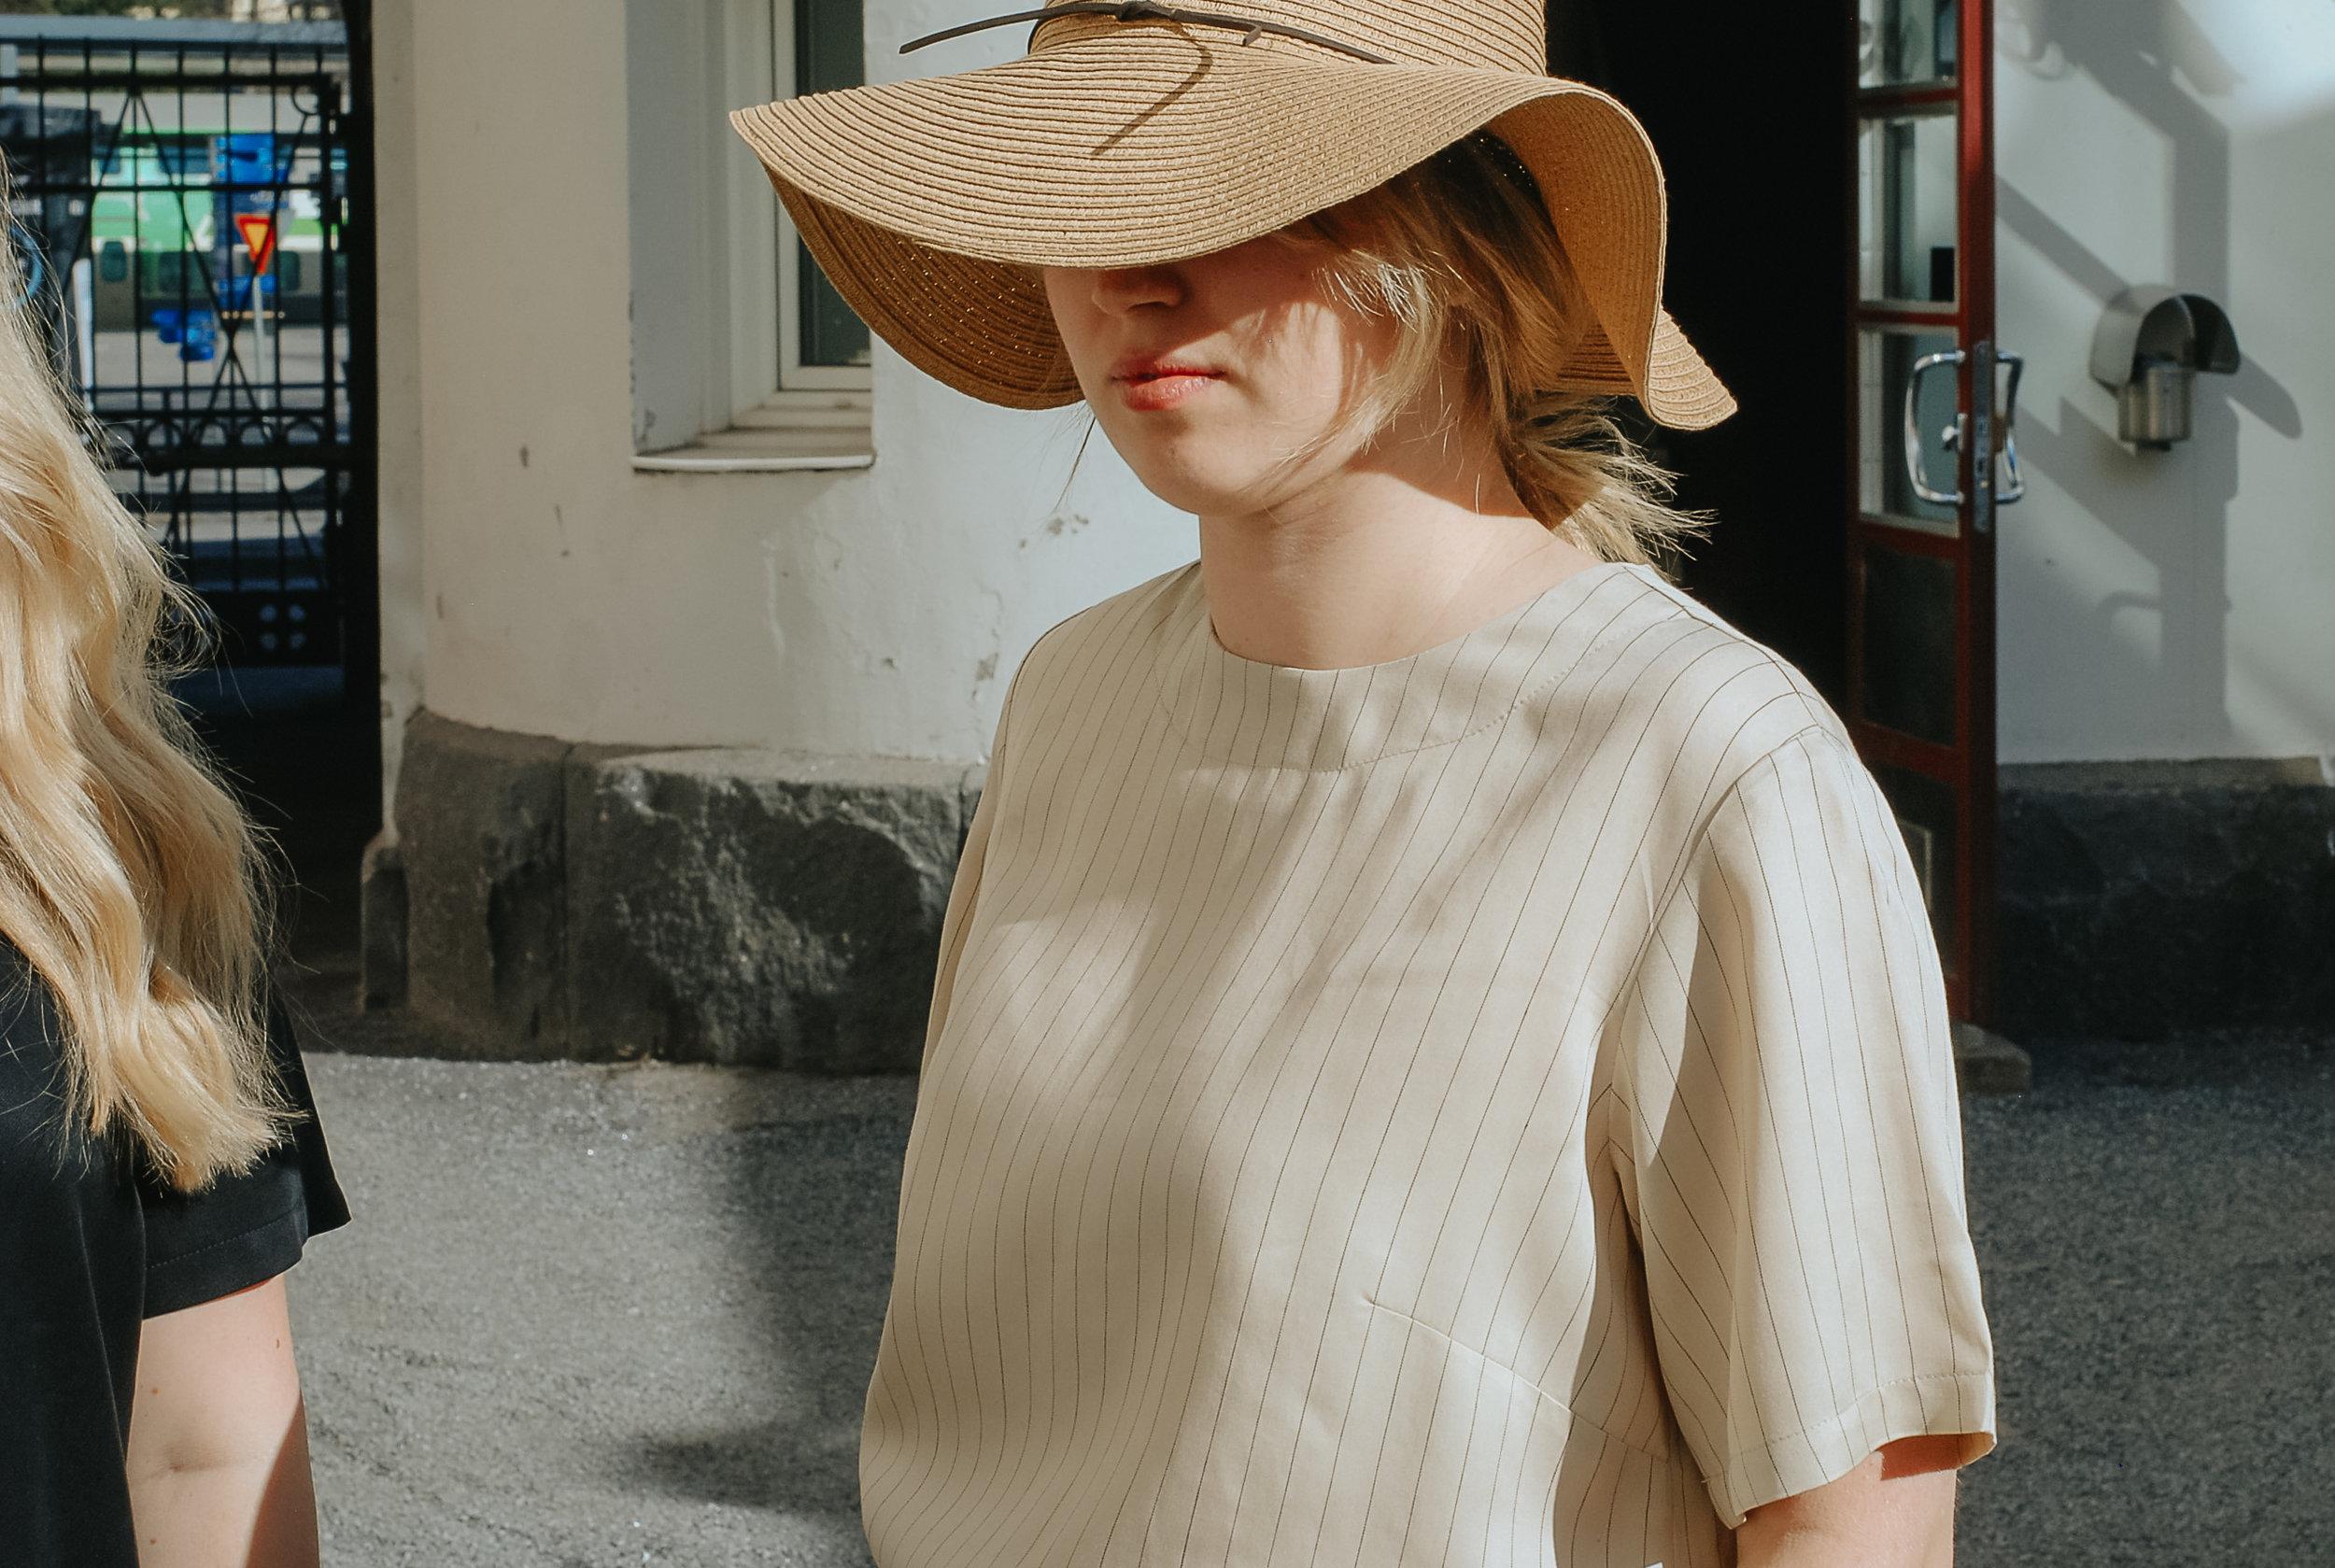 Comfortable chic - breathable garments By SärK